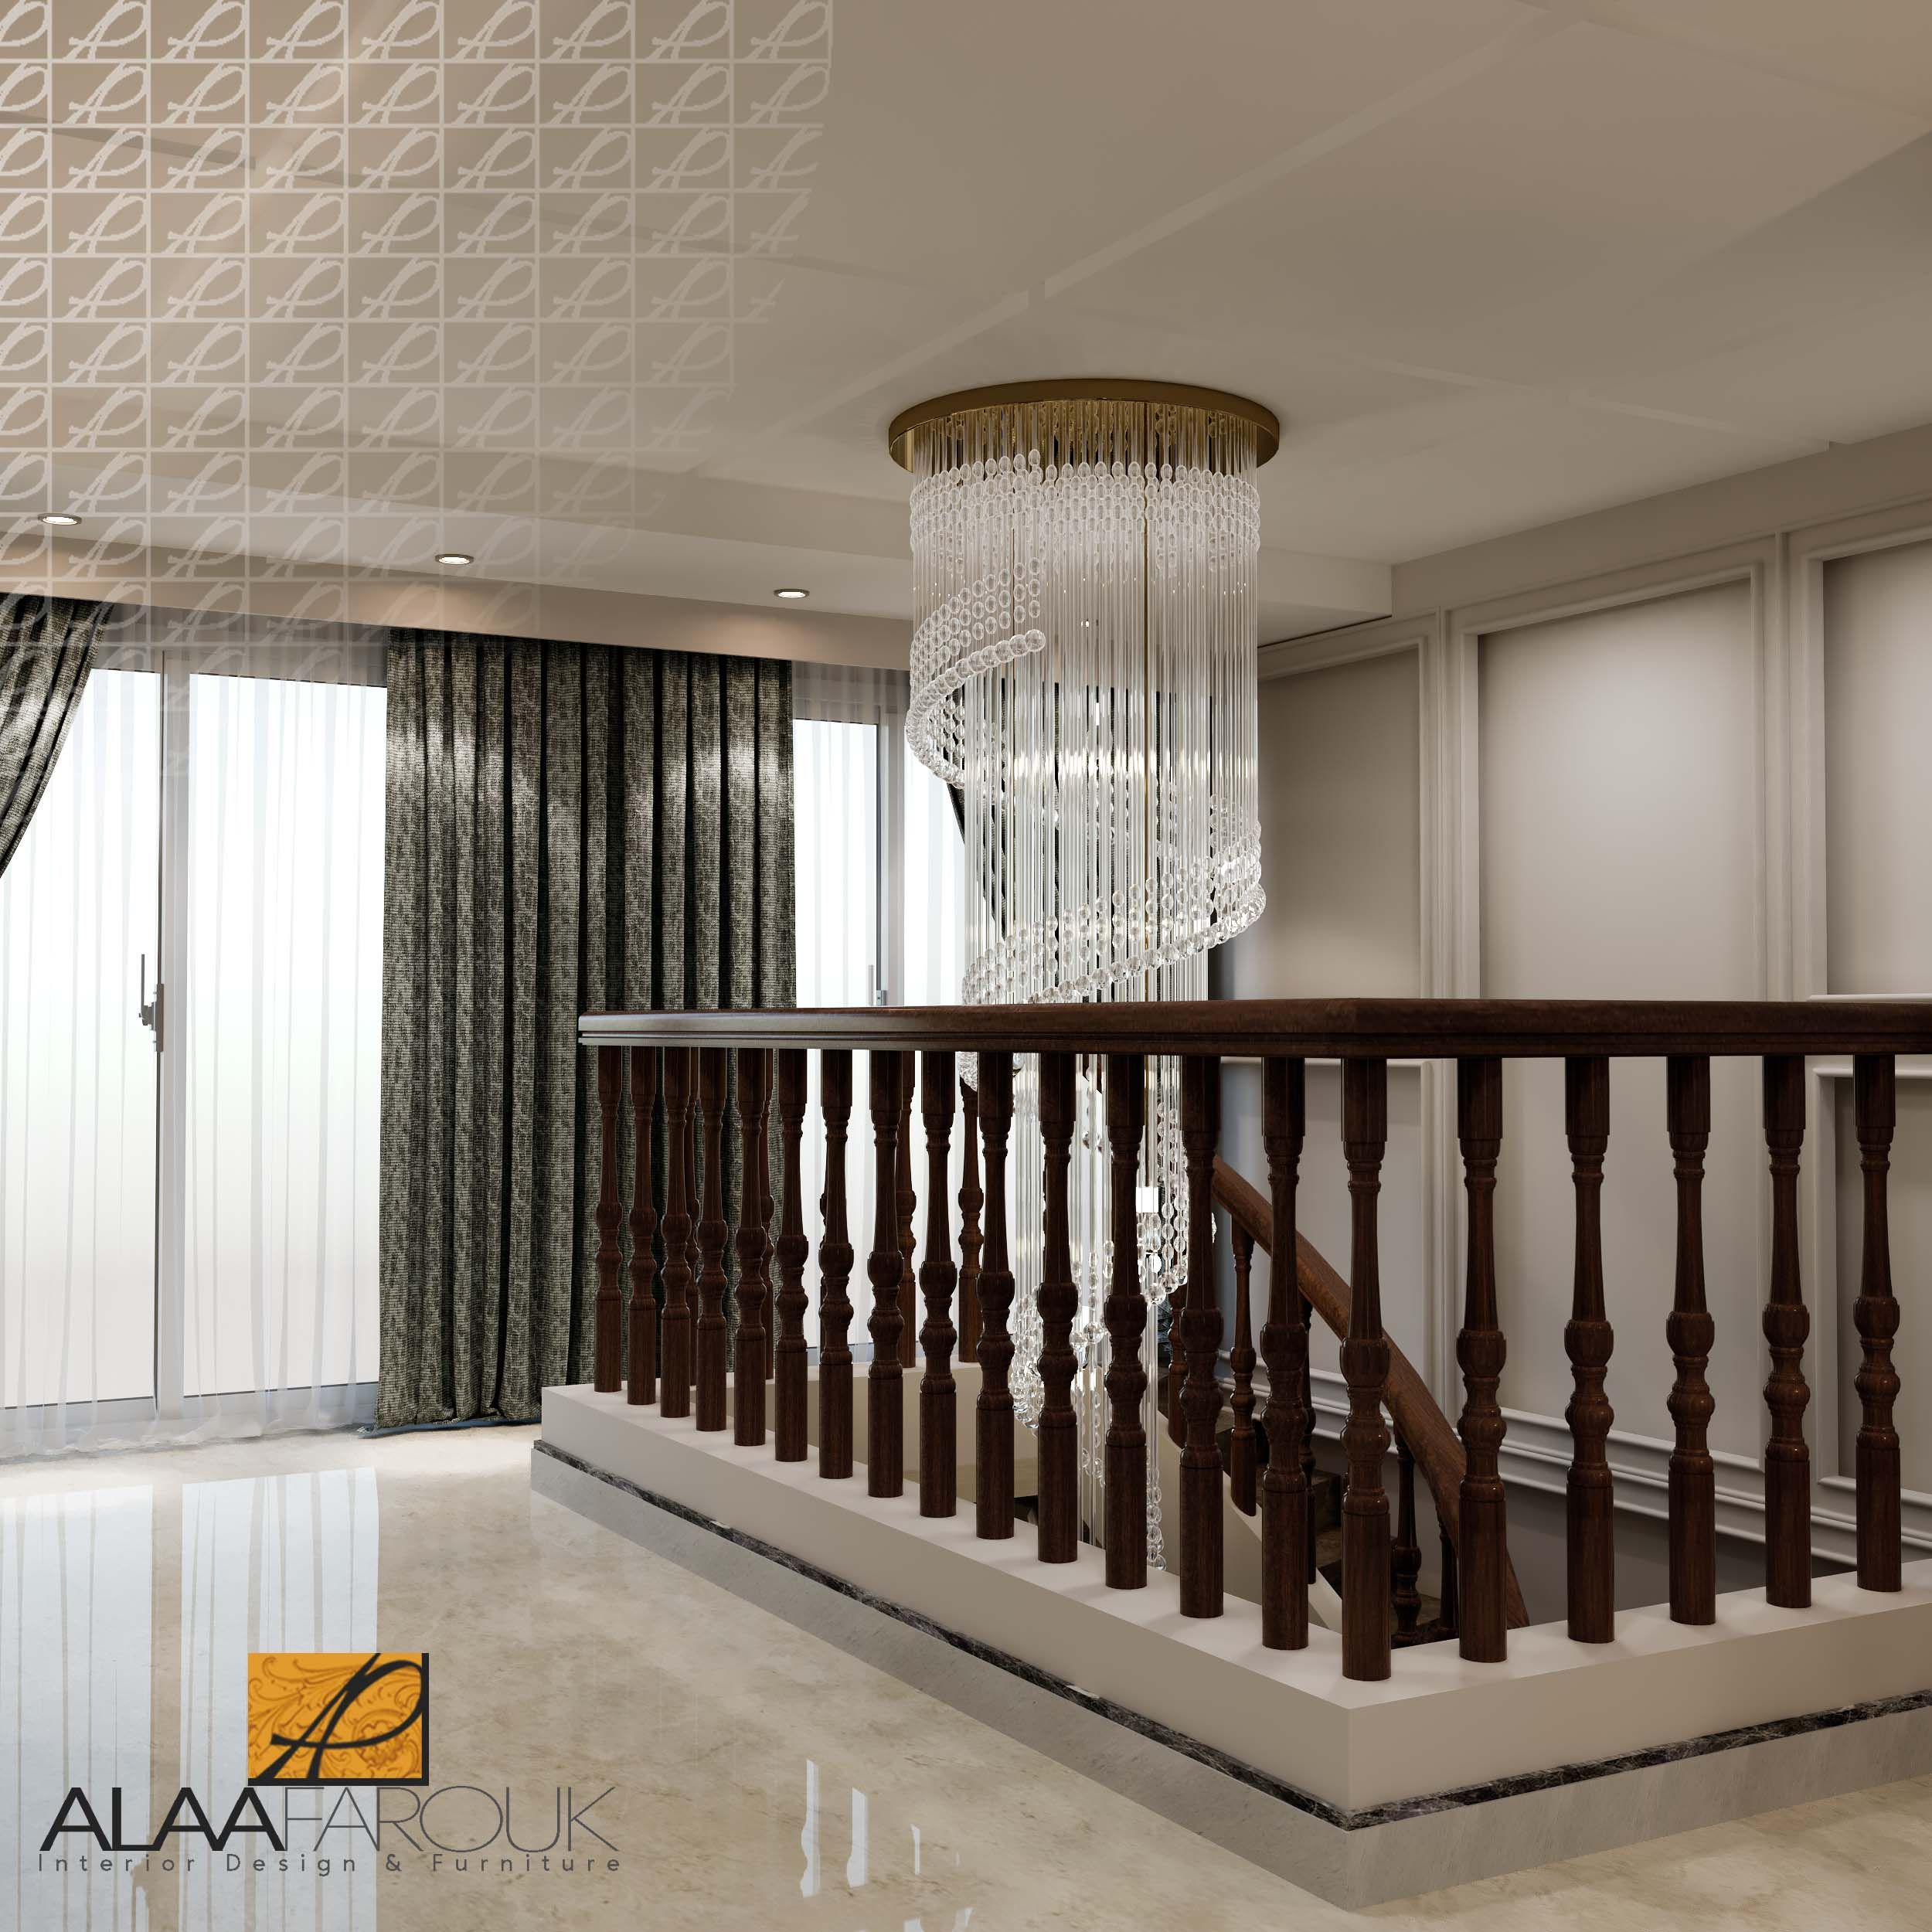 Interior Design Design Art Attack My Room شقق عيادة مودرن Golden Heights تصميم تصميم داخلي Apartment Decoration Decor Home Decor Furniture Home